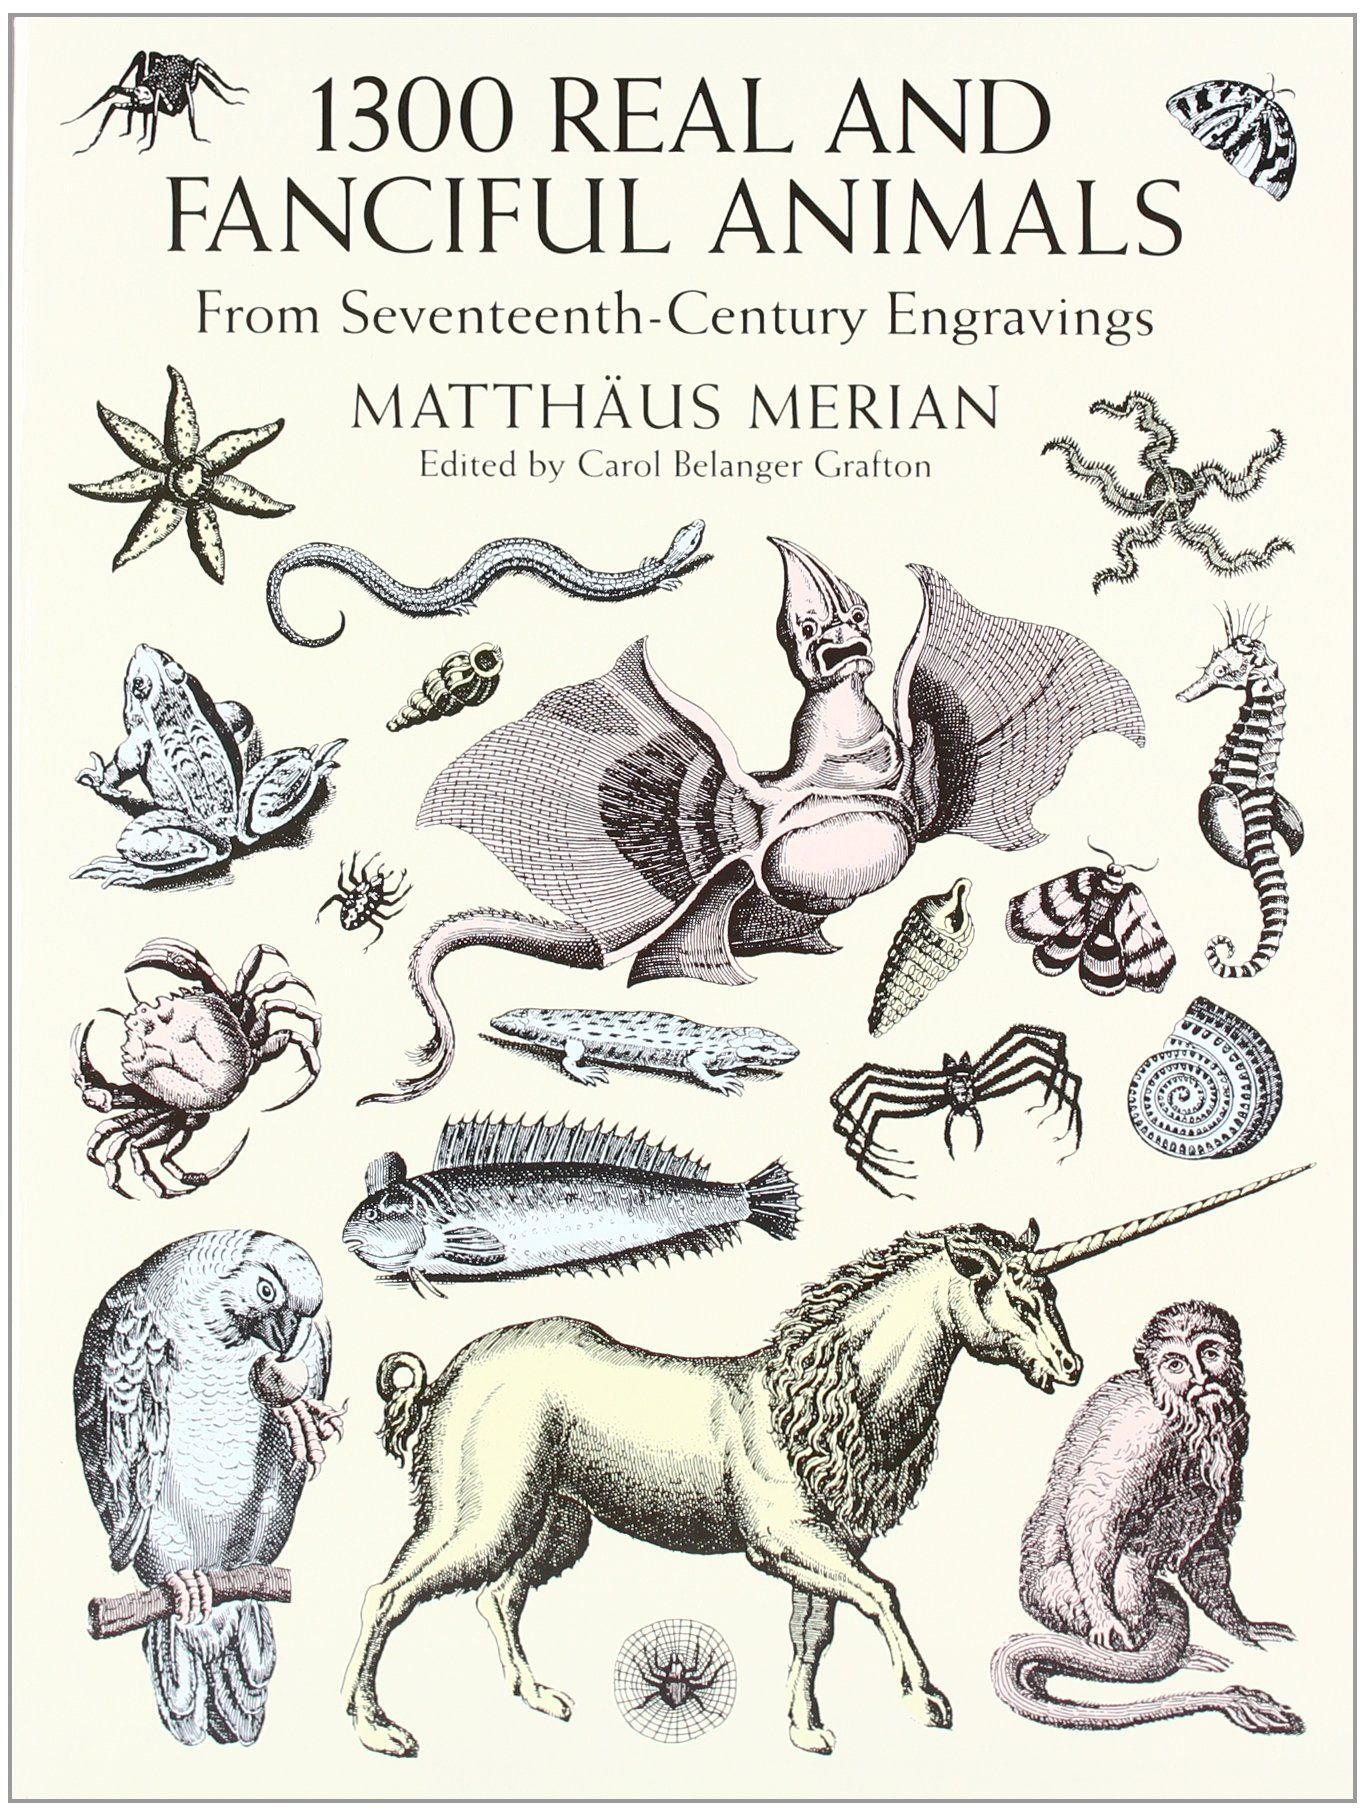 3d Design Inspiration Handbook Of Ornament By Franz Sales Meyer 3dthursday 3dprinting Ornaments Black And White Illustration Geometric Designs